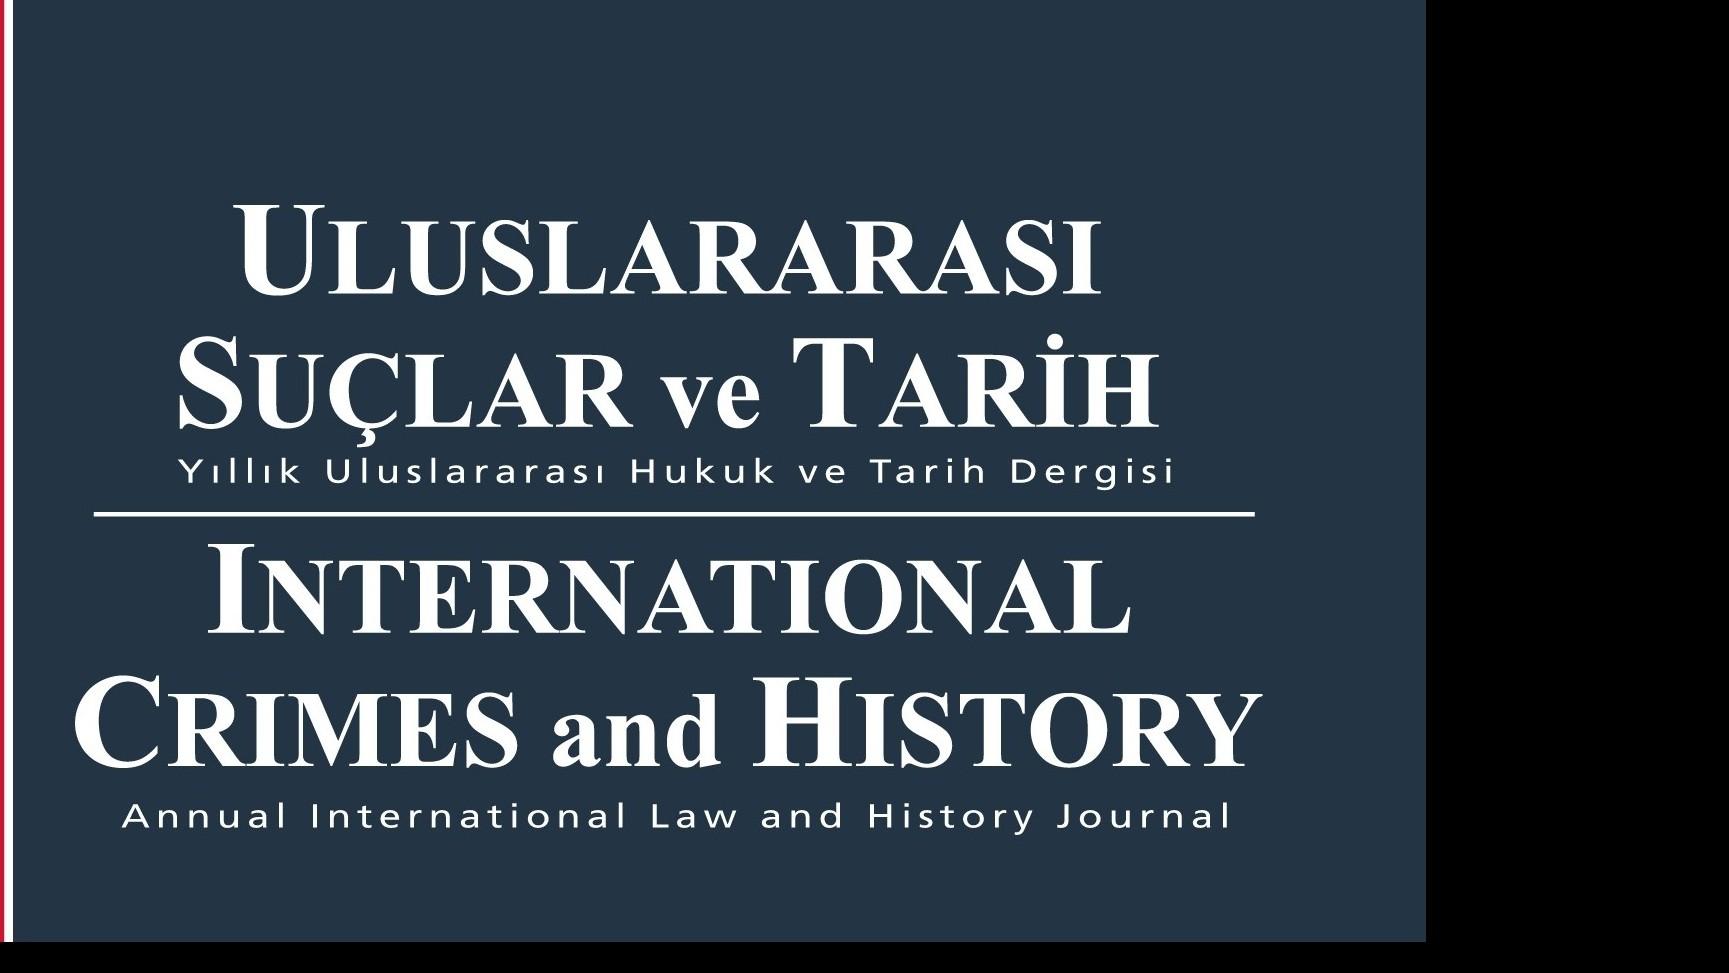 MAKALE ÇAĞRISI: ULUSLARARASI SUÇLAR VE TARİH / INTERNATIONAL CRIMES AND HISTORY- 20. SAYI